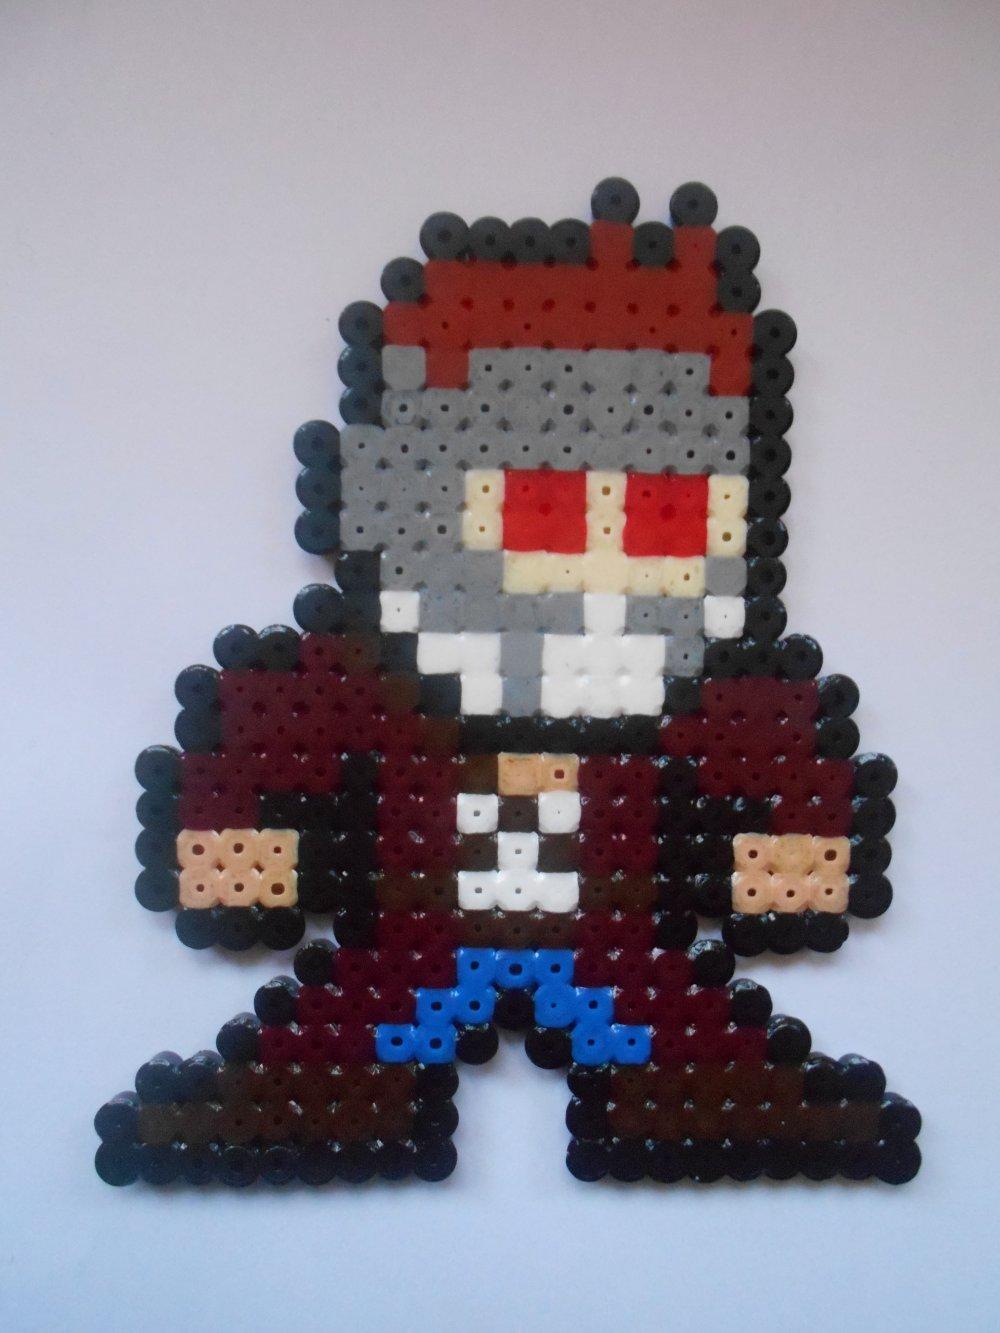 MARVEL Star Lord Gardiens de la Galaxie - décoration en perles à repasser Hama - Pixel / Geek Art